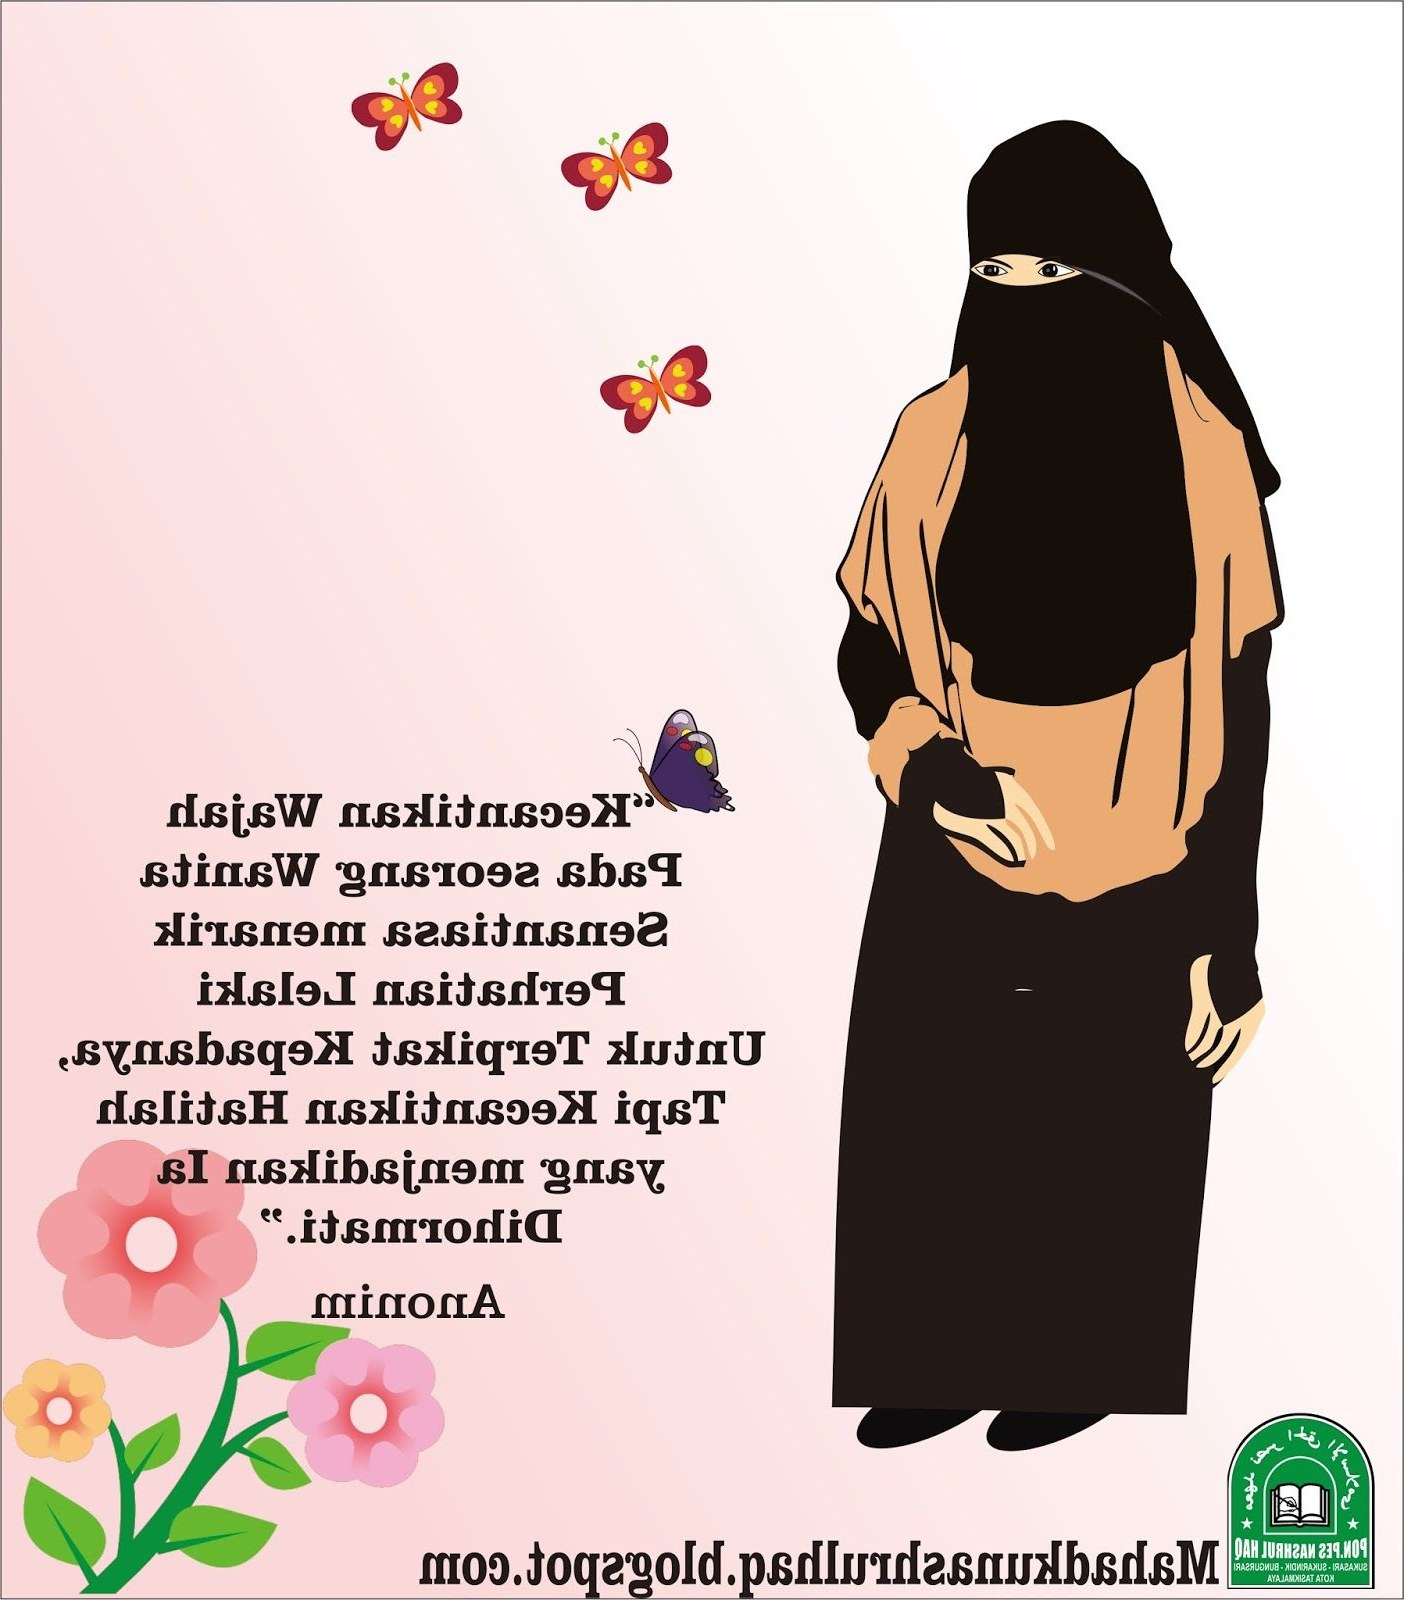 Design Muslimah Bercadar Dari Belakang Q5df Gambar Kartun Muslimah Bercadar Tentang Kecantikan Hati